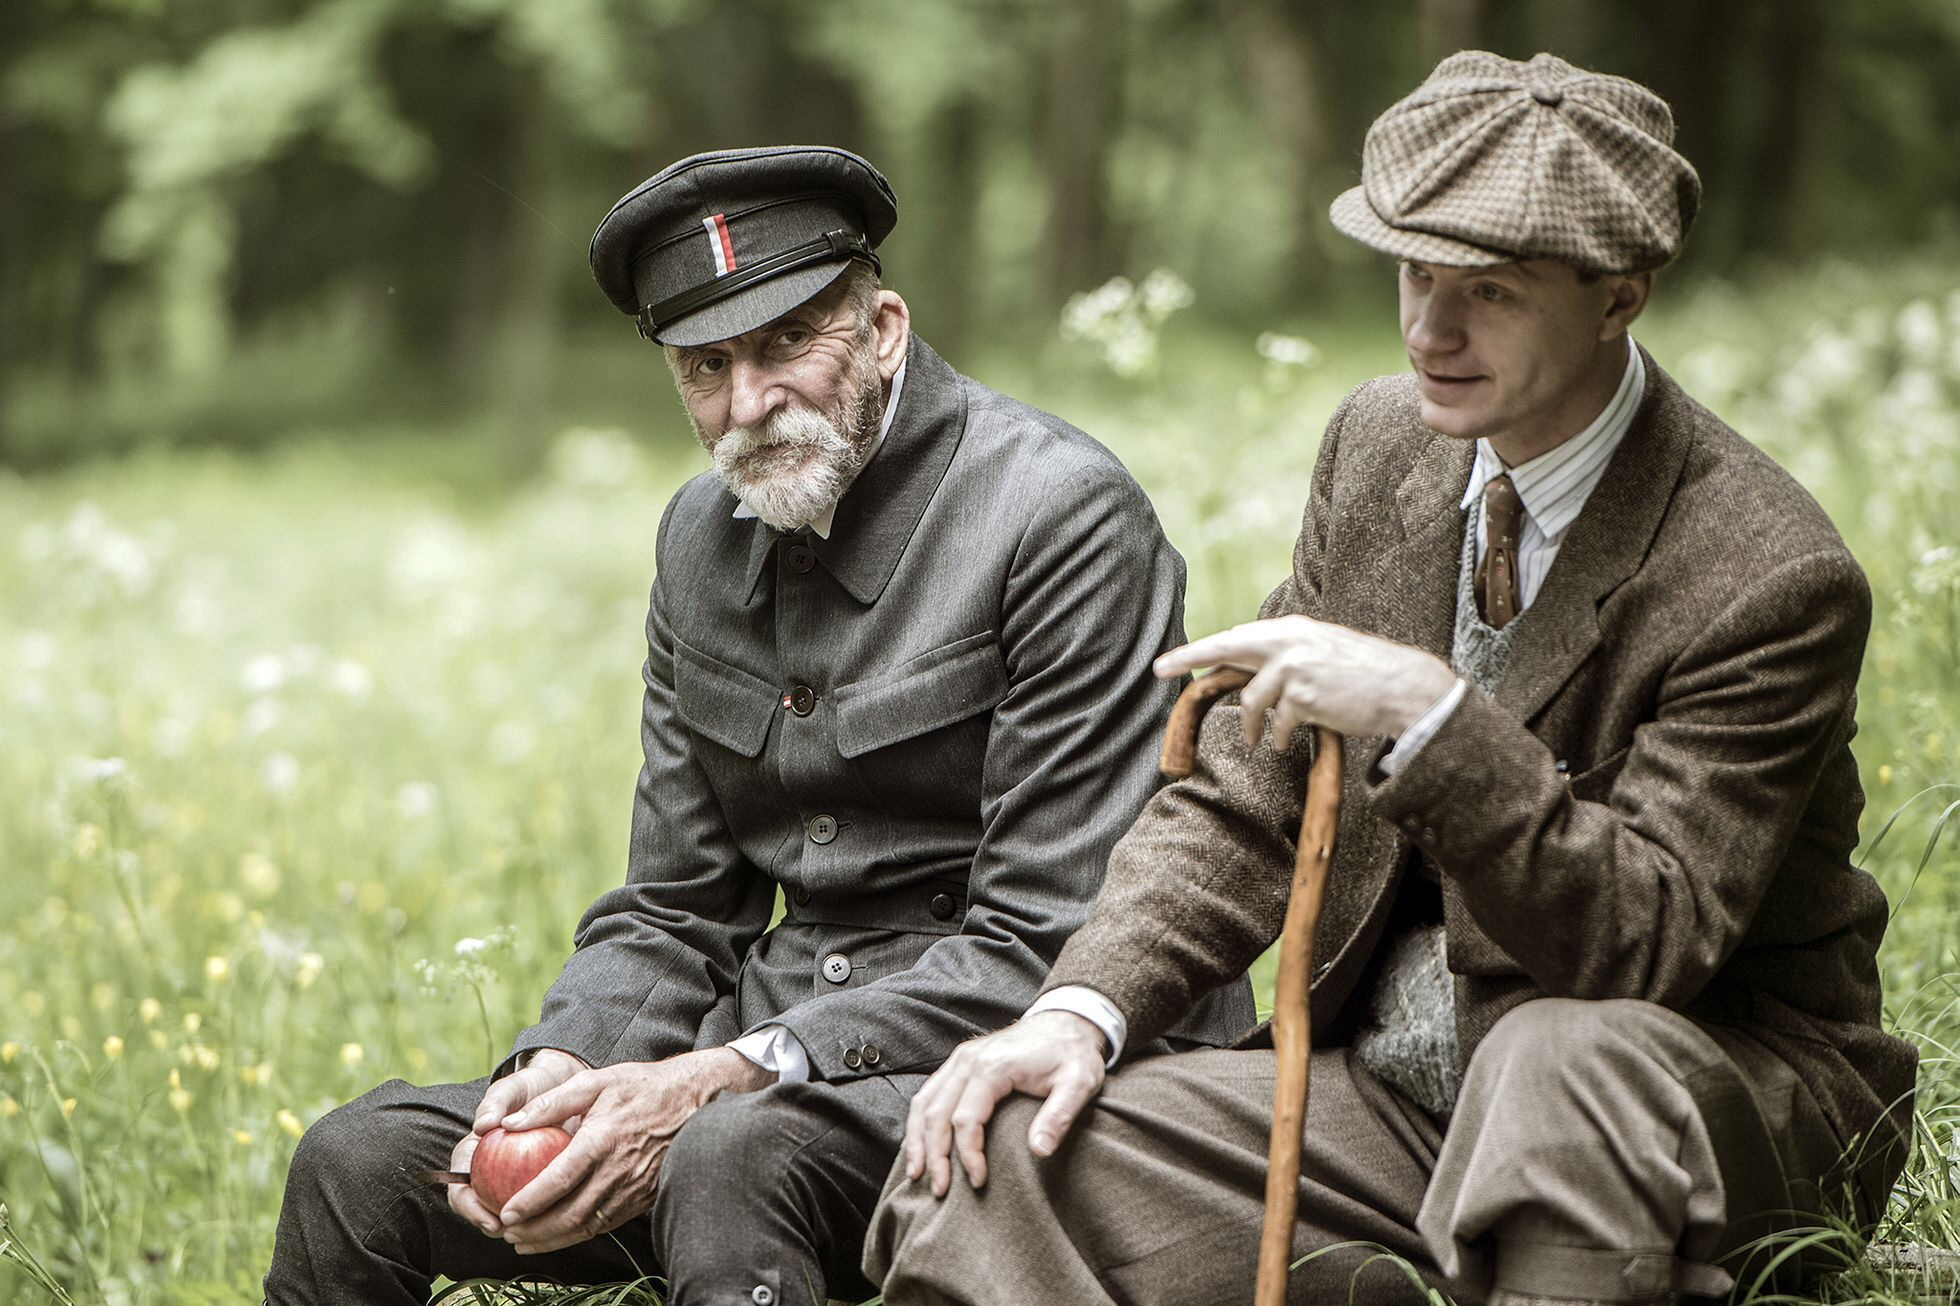 Martine Huba plays Tomas Masaryk and Jan Bucaramanga plays Karel Capek in the 2018 film Talks with TGM.